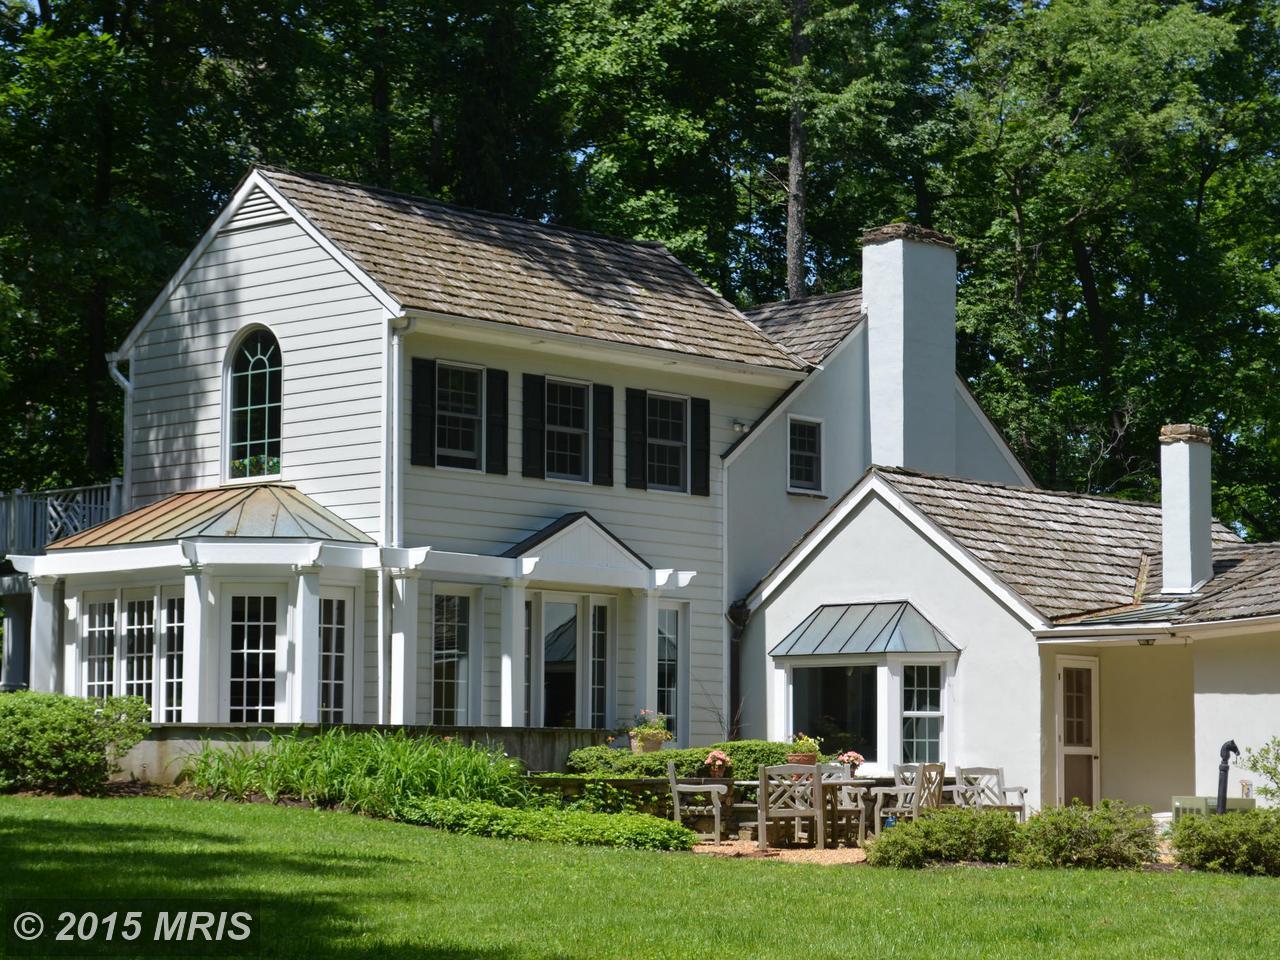 Residential Properties For Sale In Middleburg Va